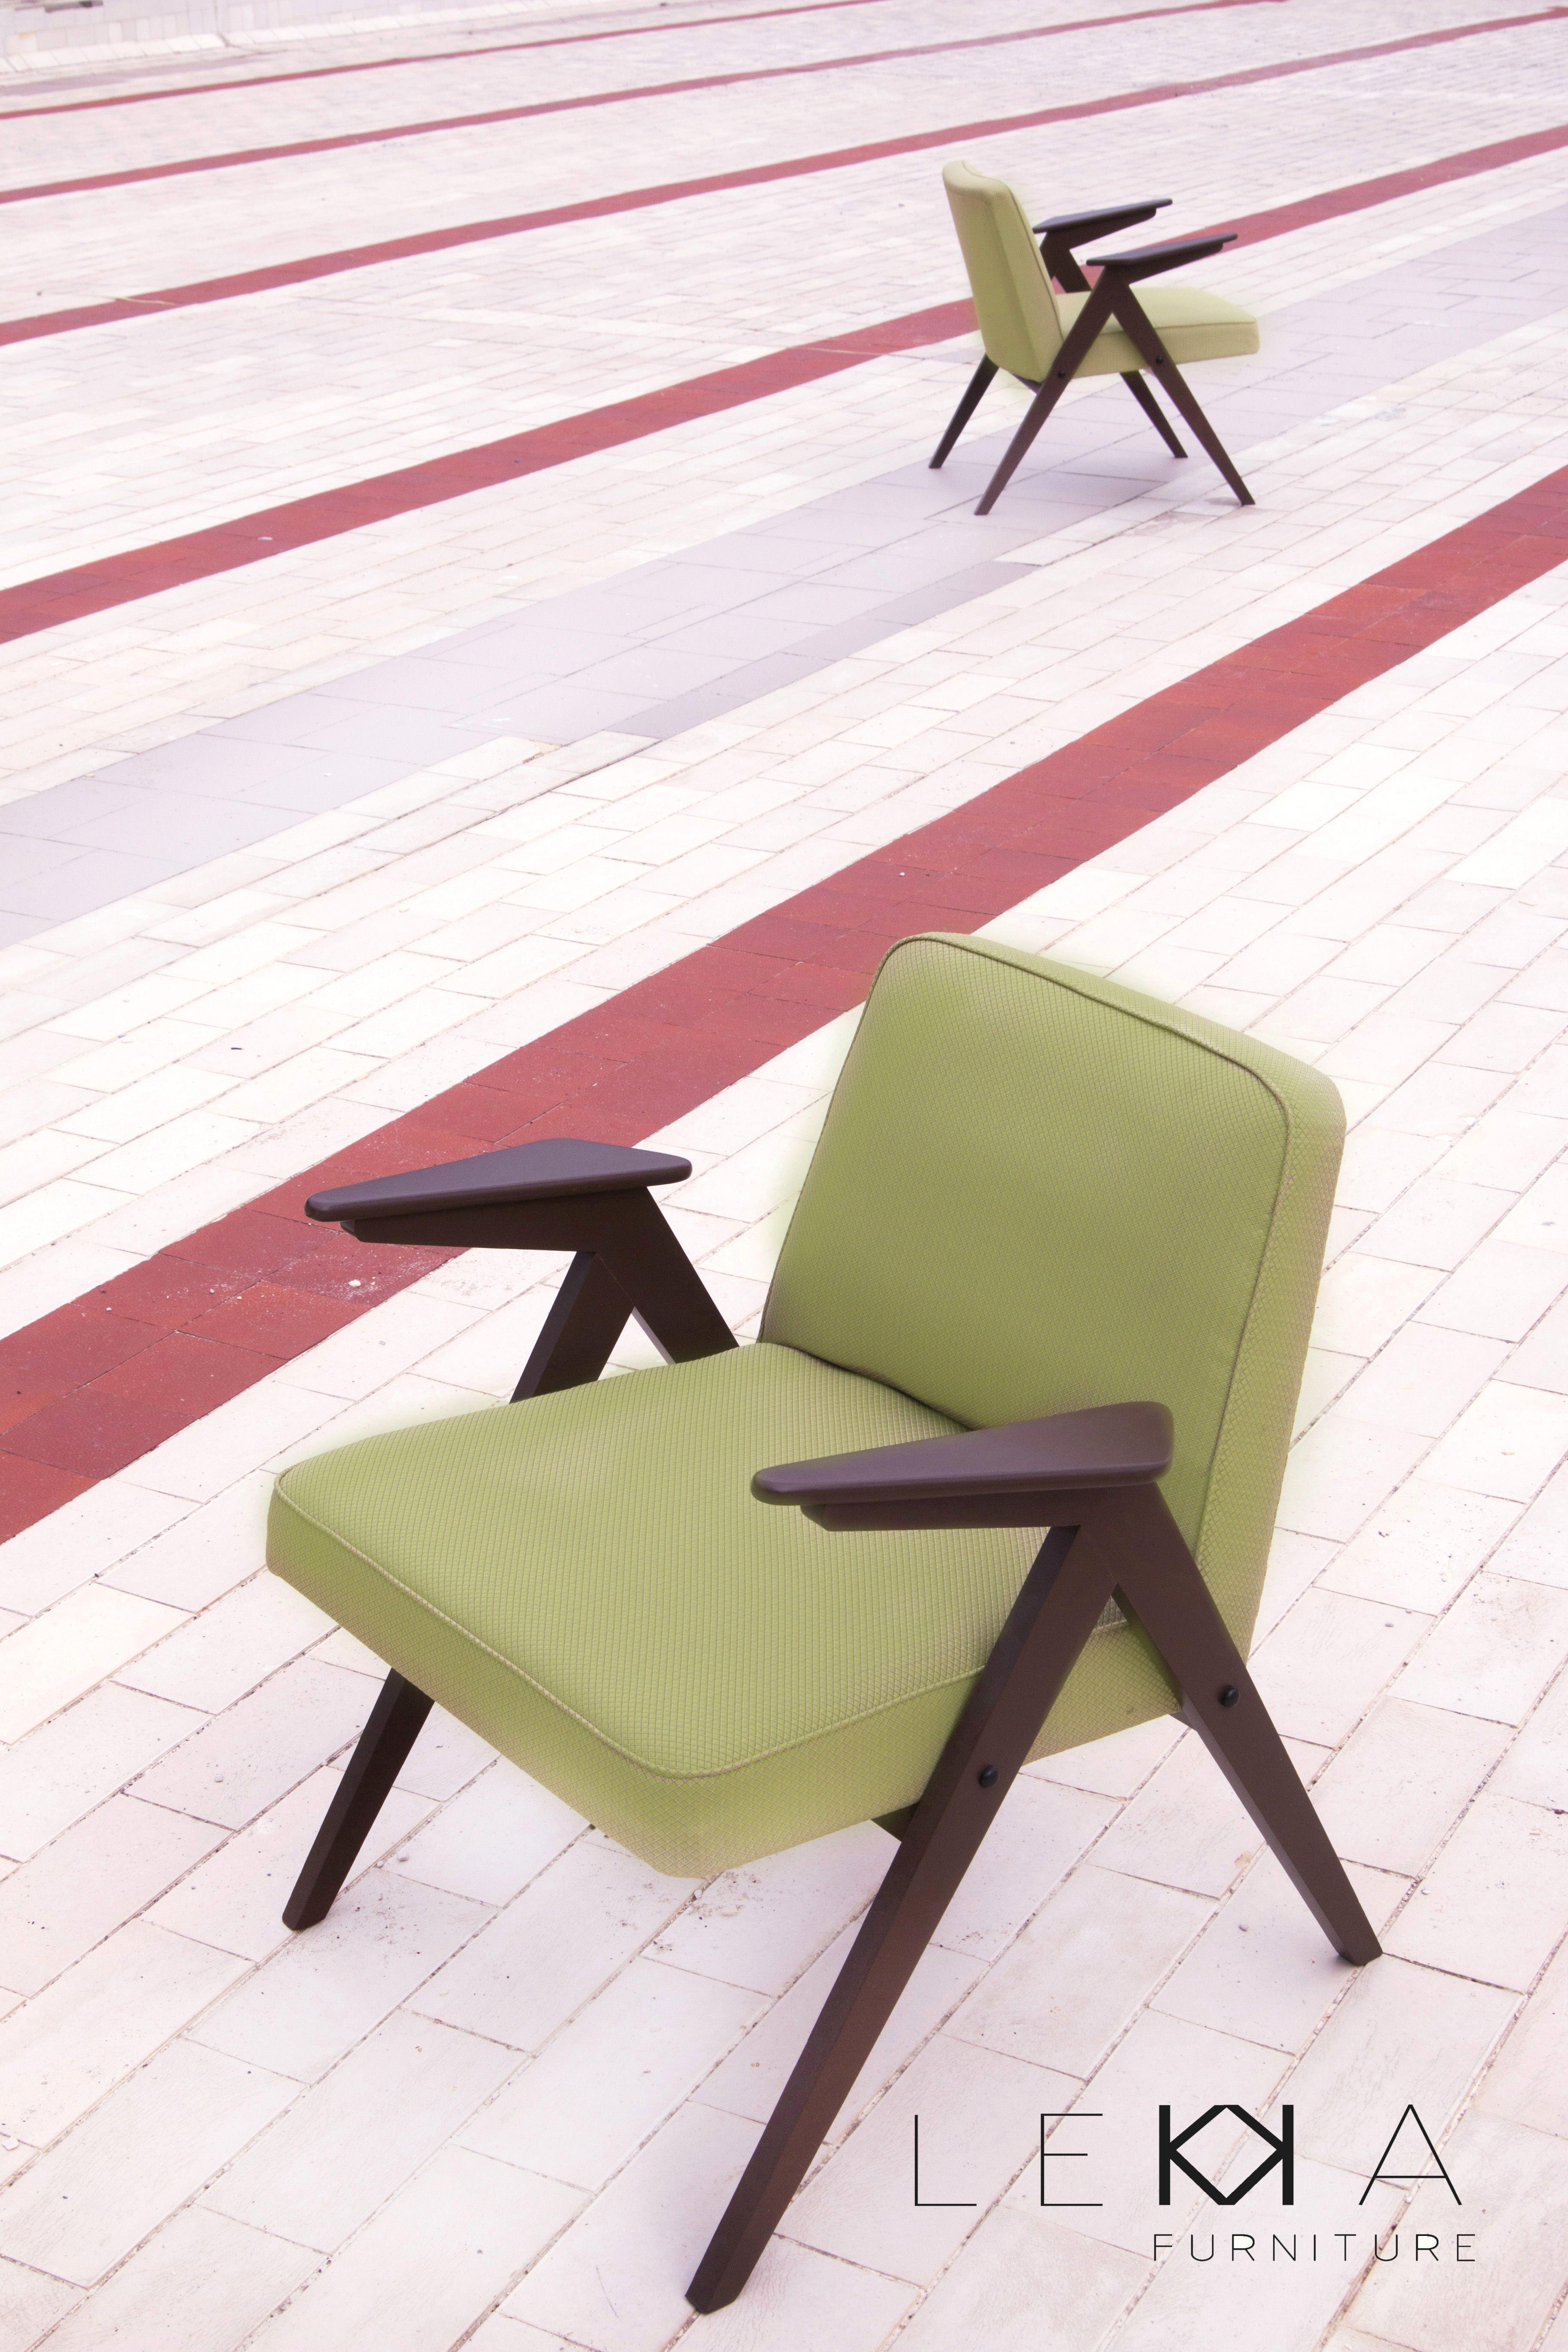 Fotel Projektu Prof J Chierowski Model 366 Prl Loft Vintage Lata 60 Renowacja Lekka Furniture Armchair De Armchair Furniture Armchair Design Furniture